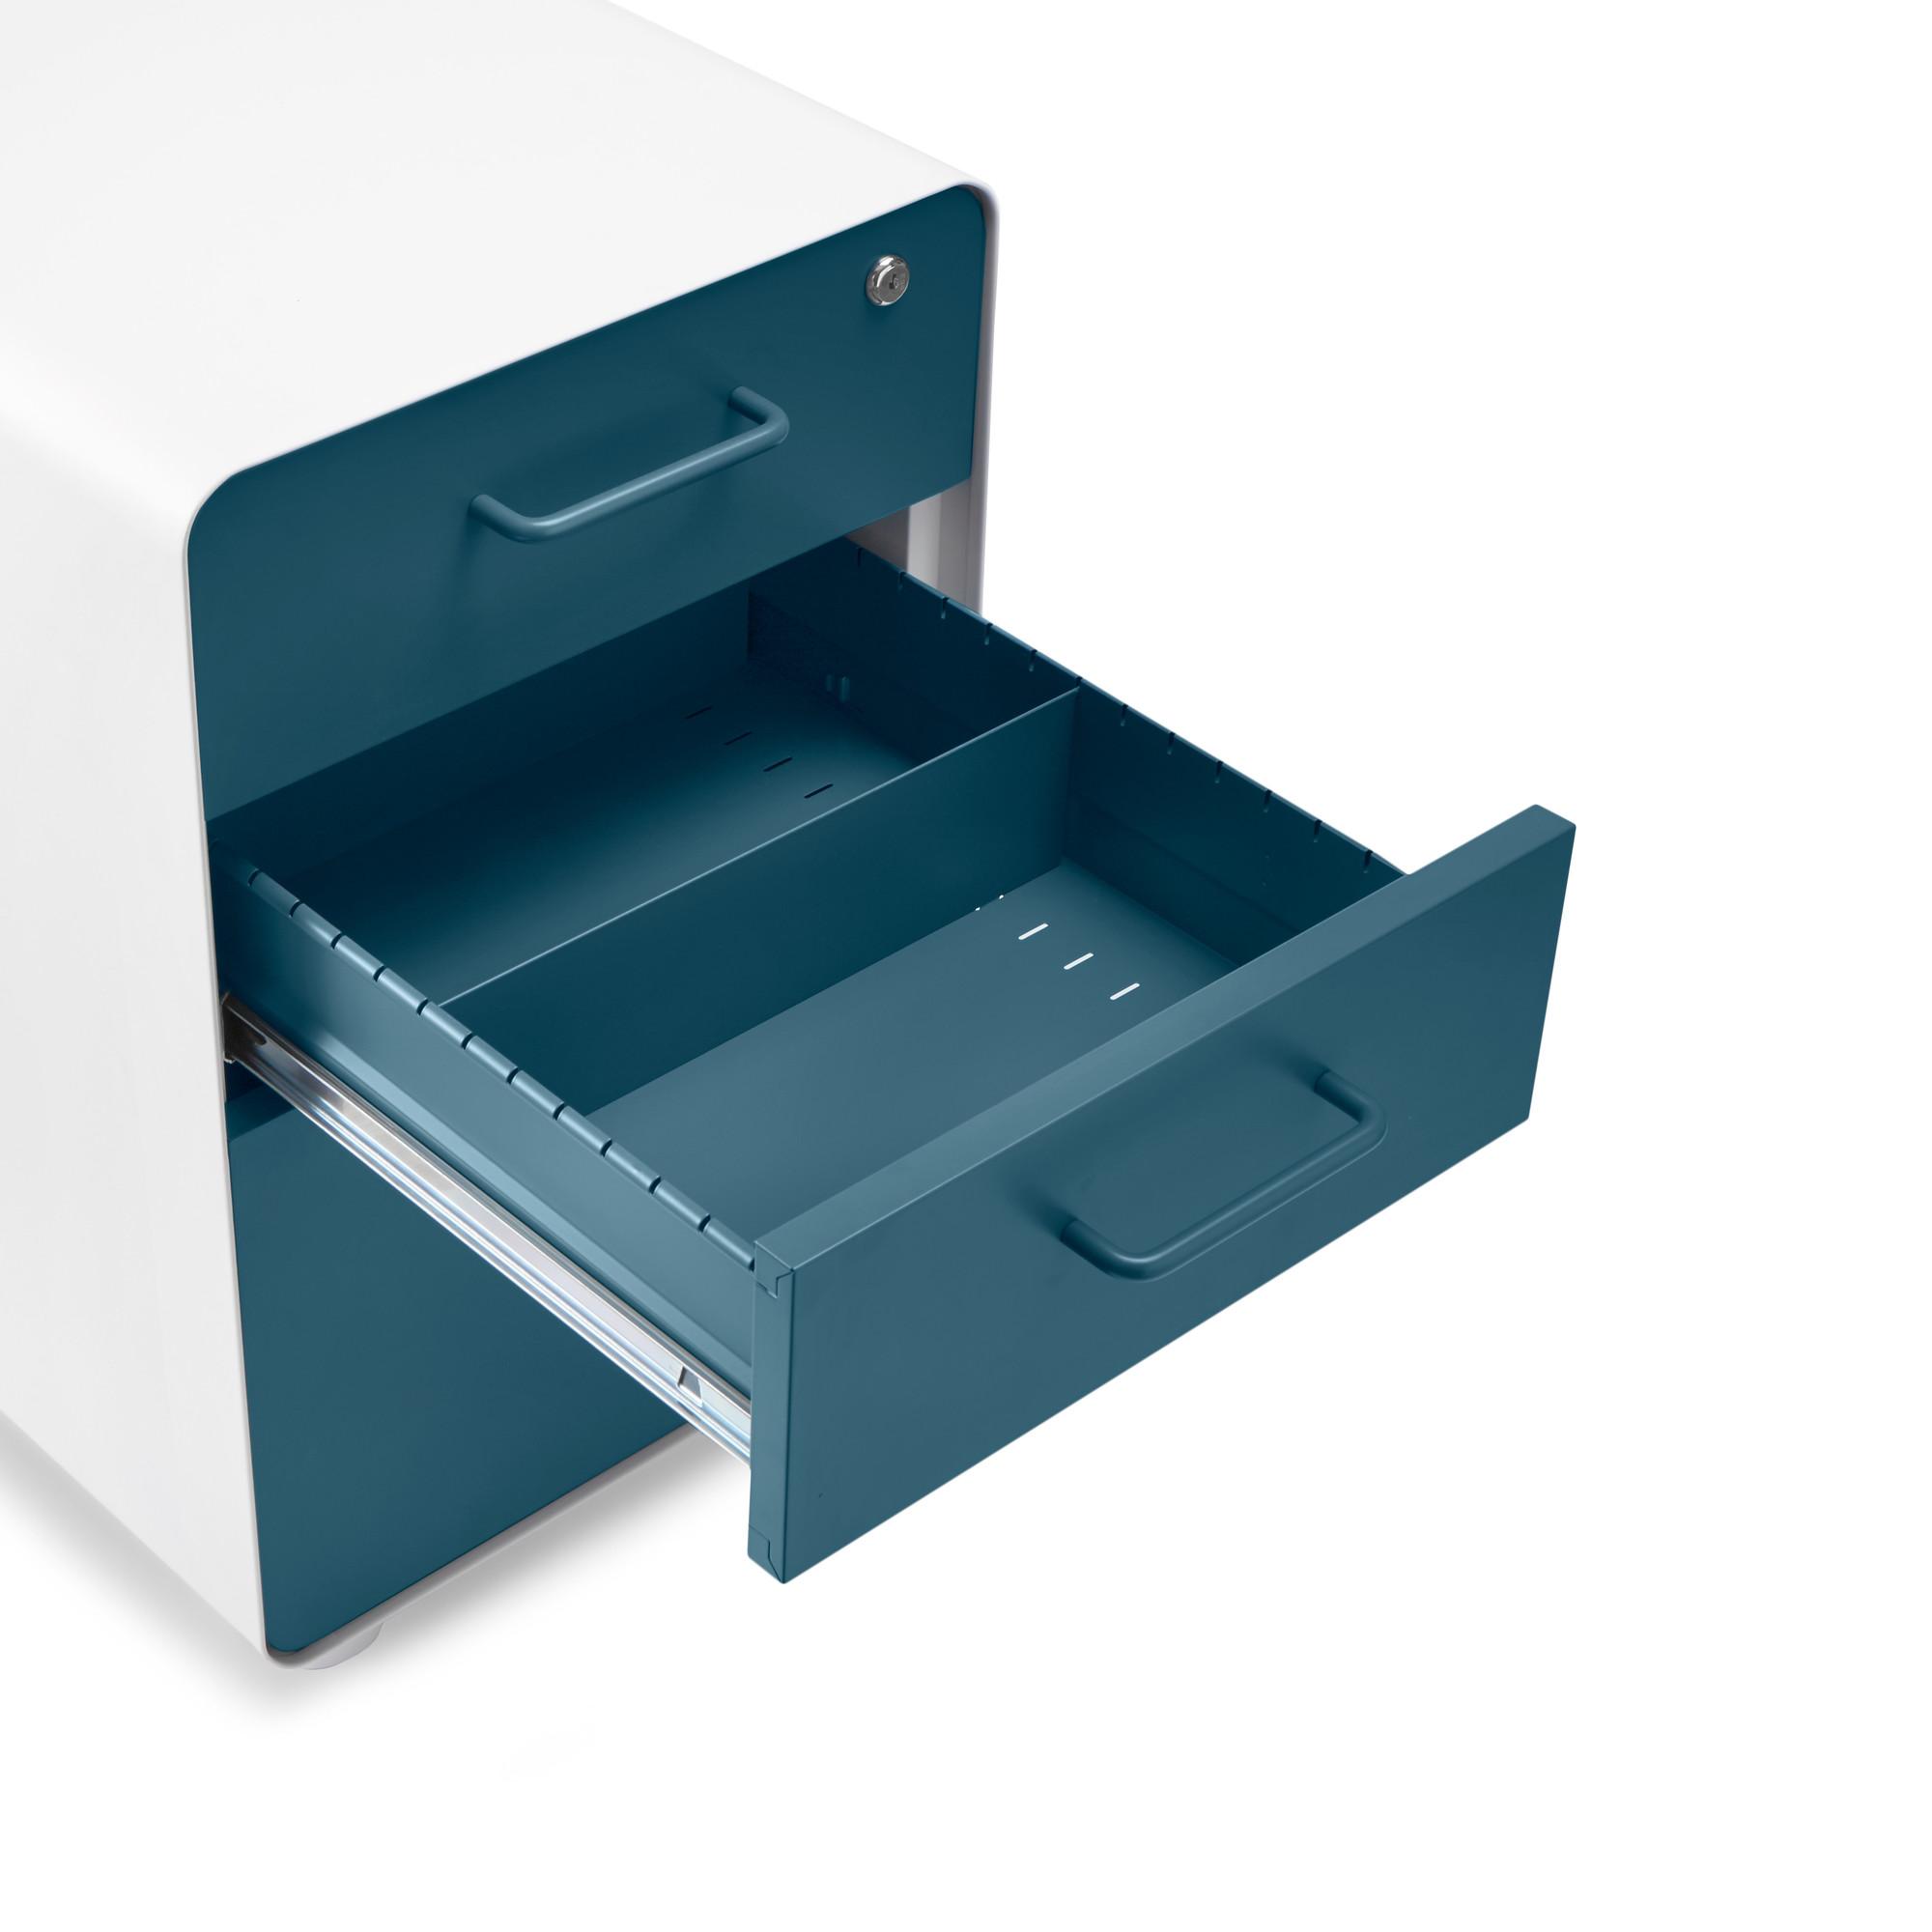 Rolling Metal Locking File Cabinets   Modern Office Furniture   Poppin